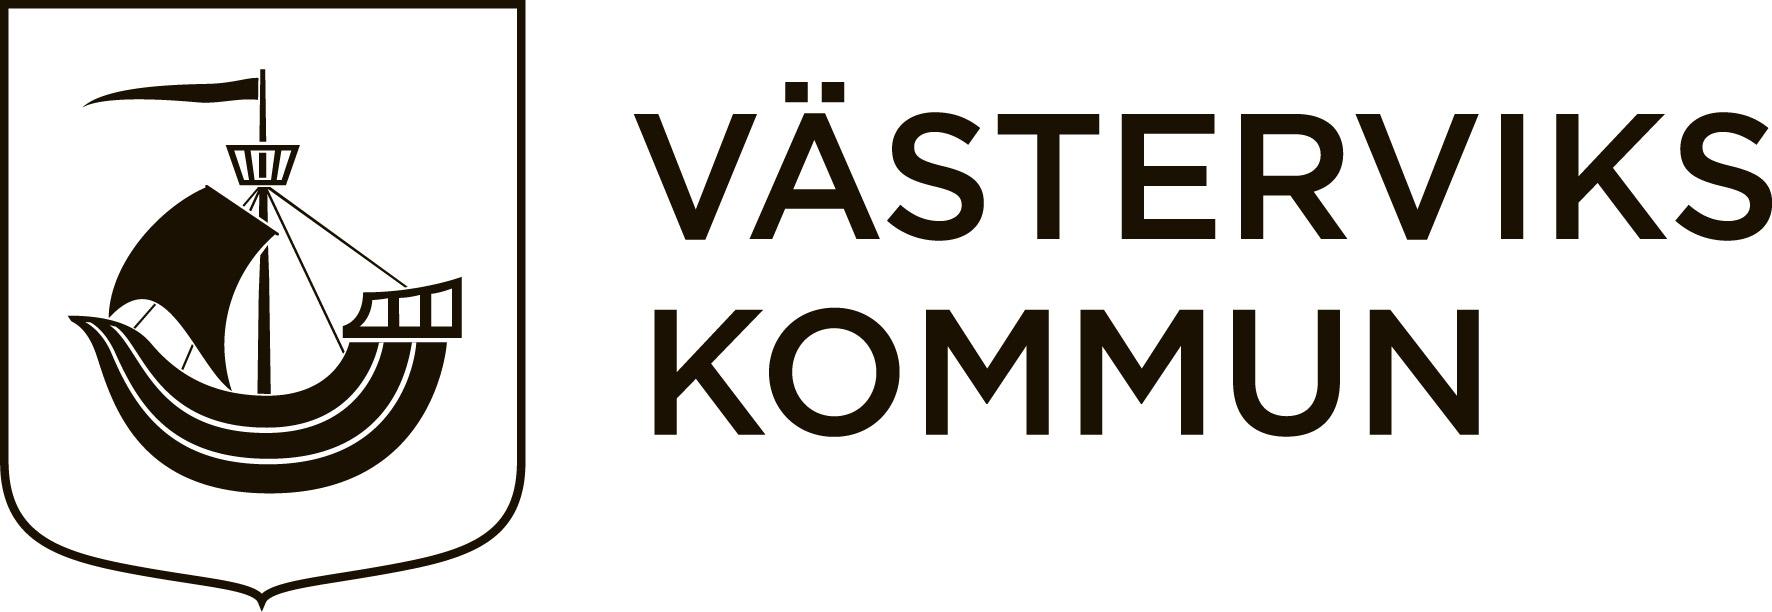 Västerviks kommun